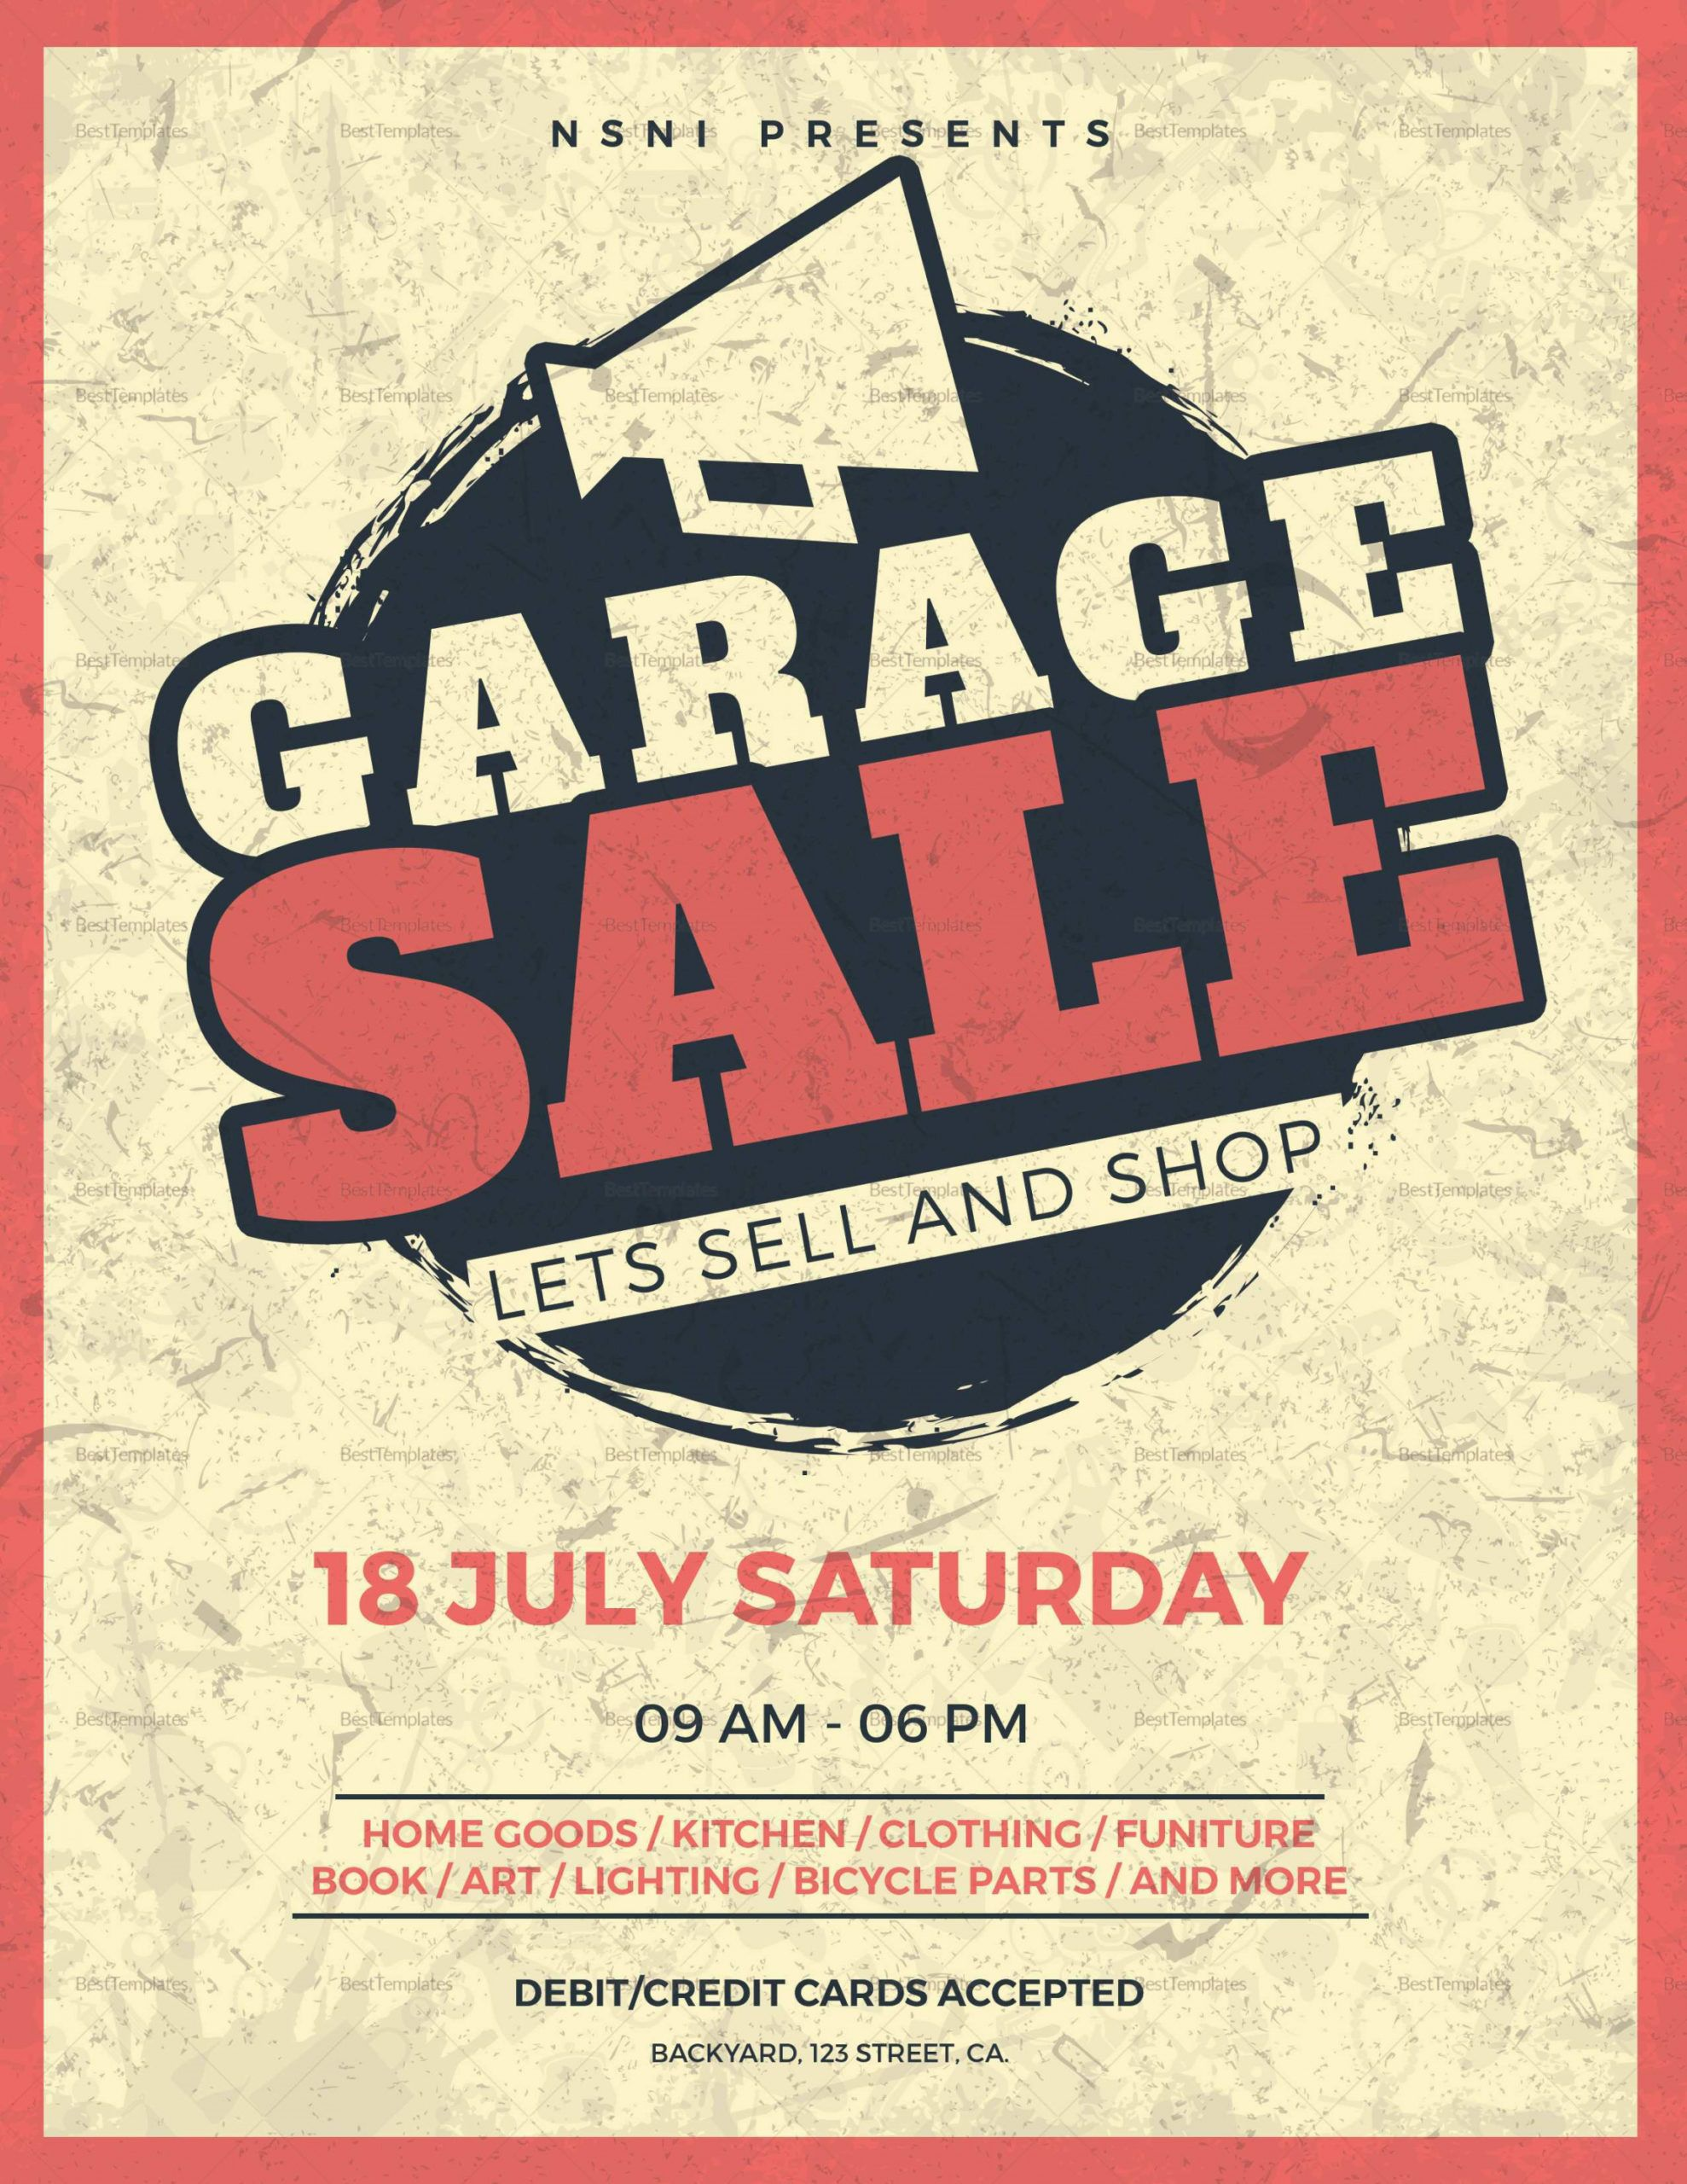 84 blank garage sale flyer template in photoshop by garage rummage sale flyer template pdf